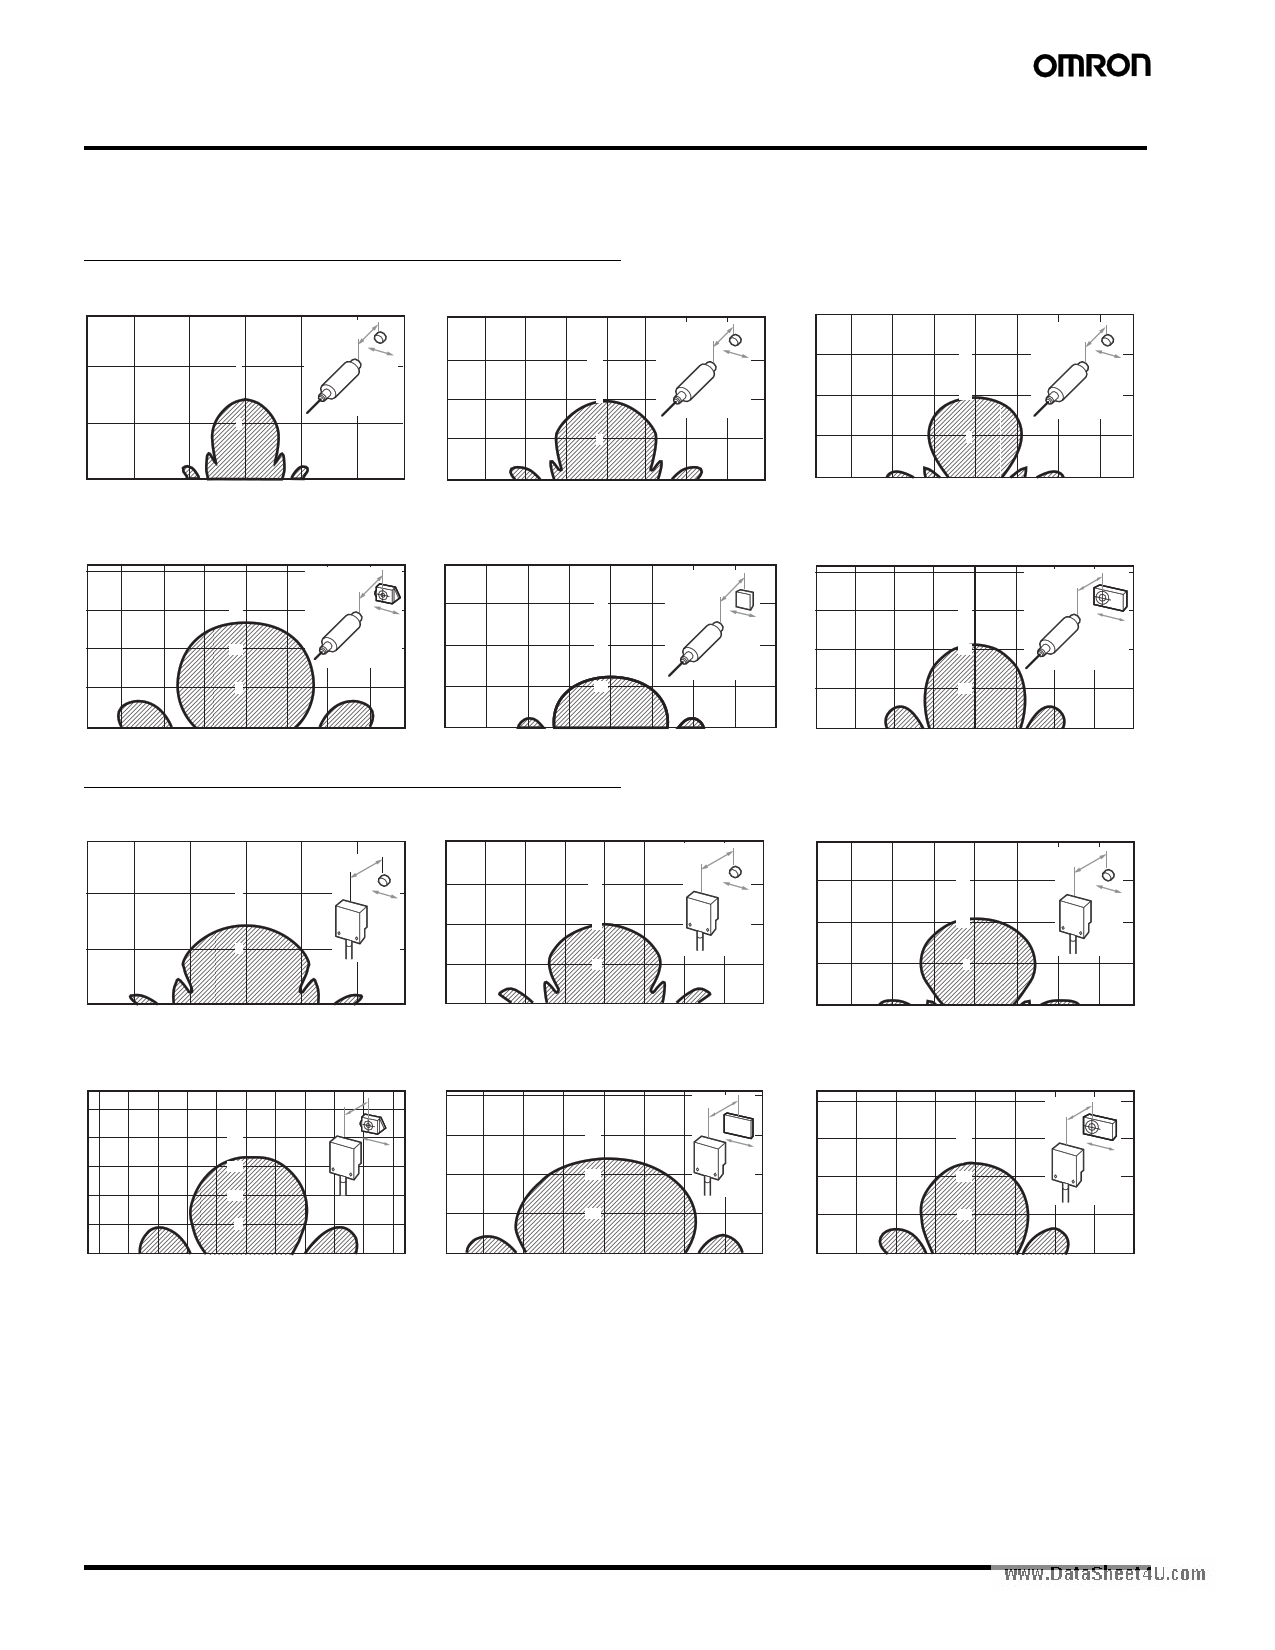 V600-HA pdf